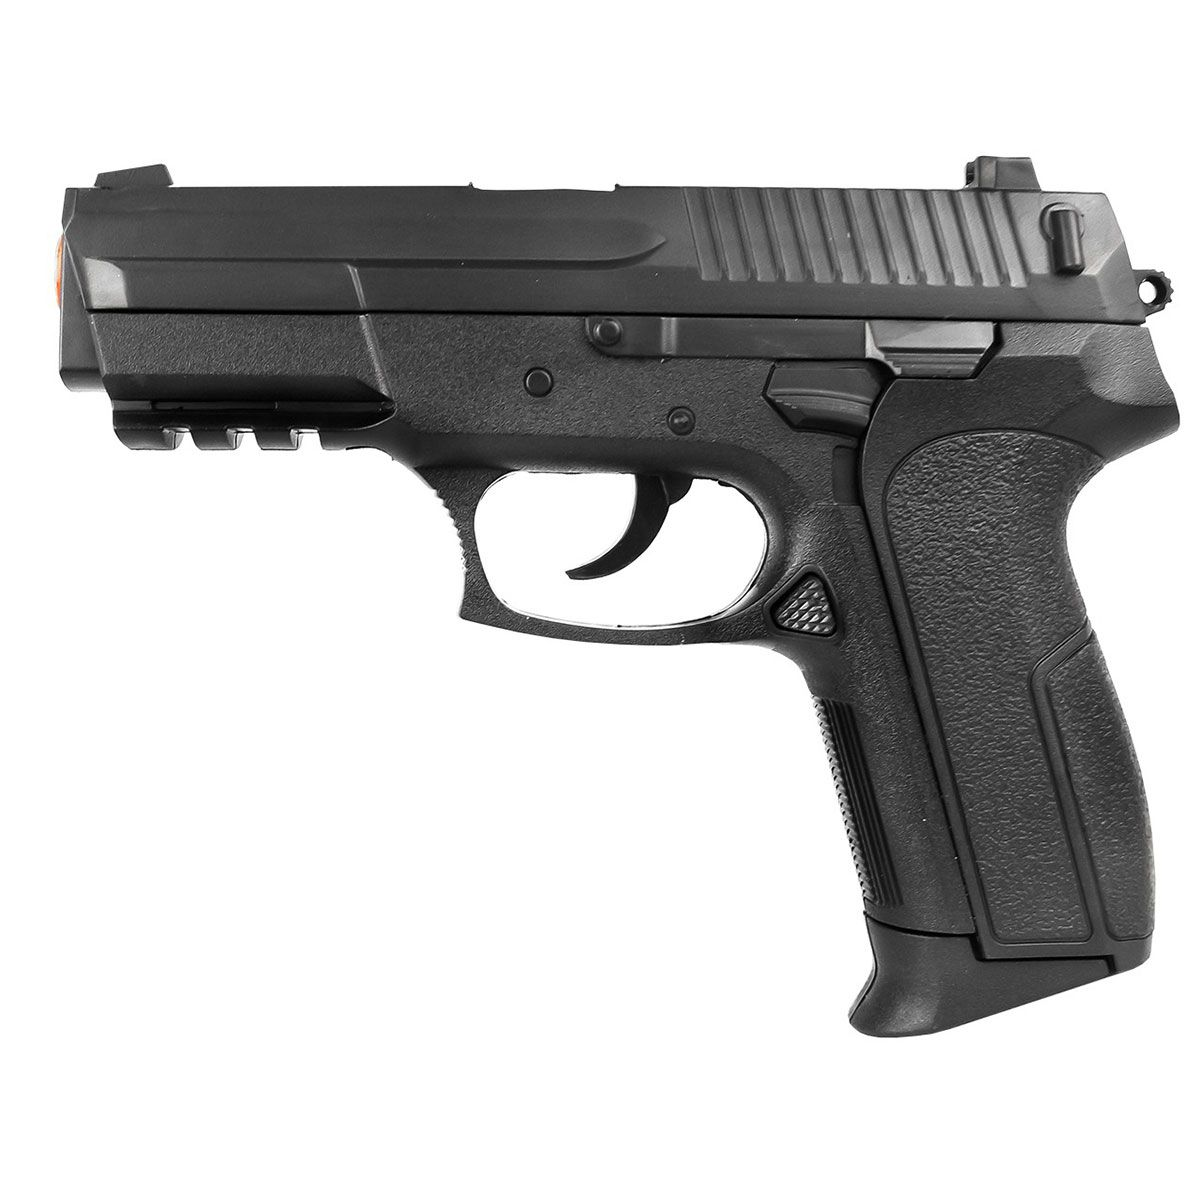 Pistola Airsoft Spring KWC VG S2022 Calibre 6mm